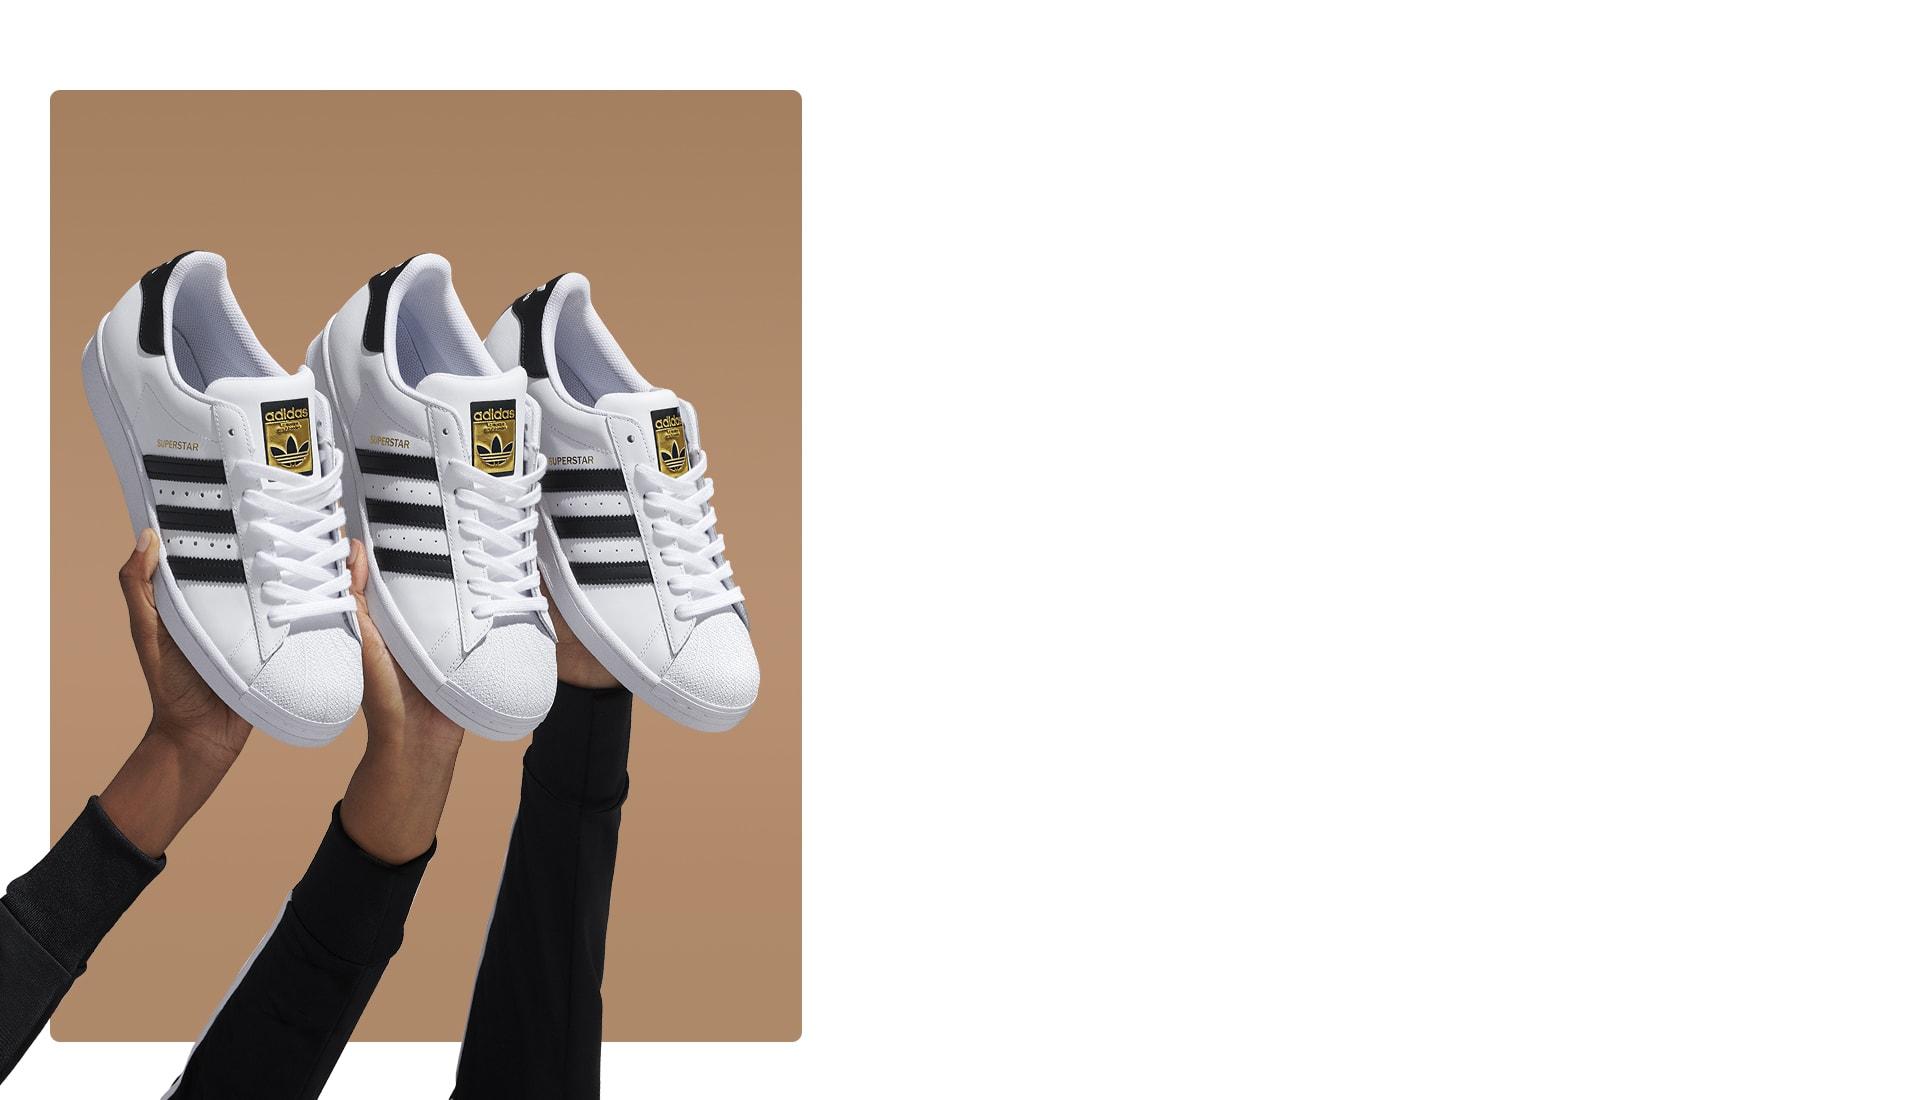 Originals Sneakers & Clothing  adidas Germany